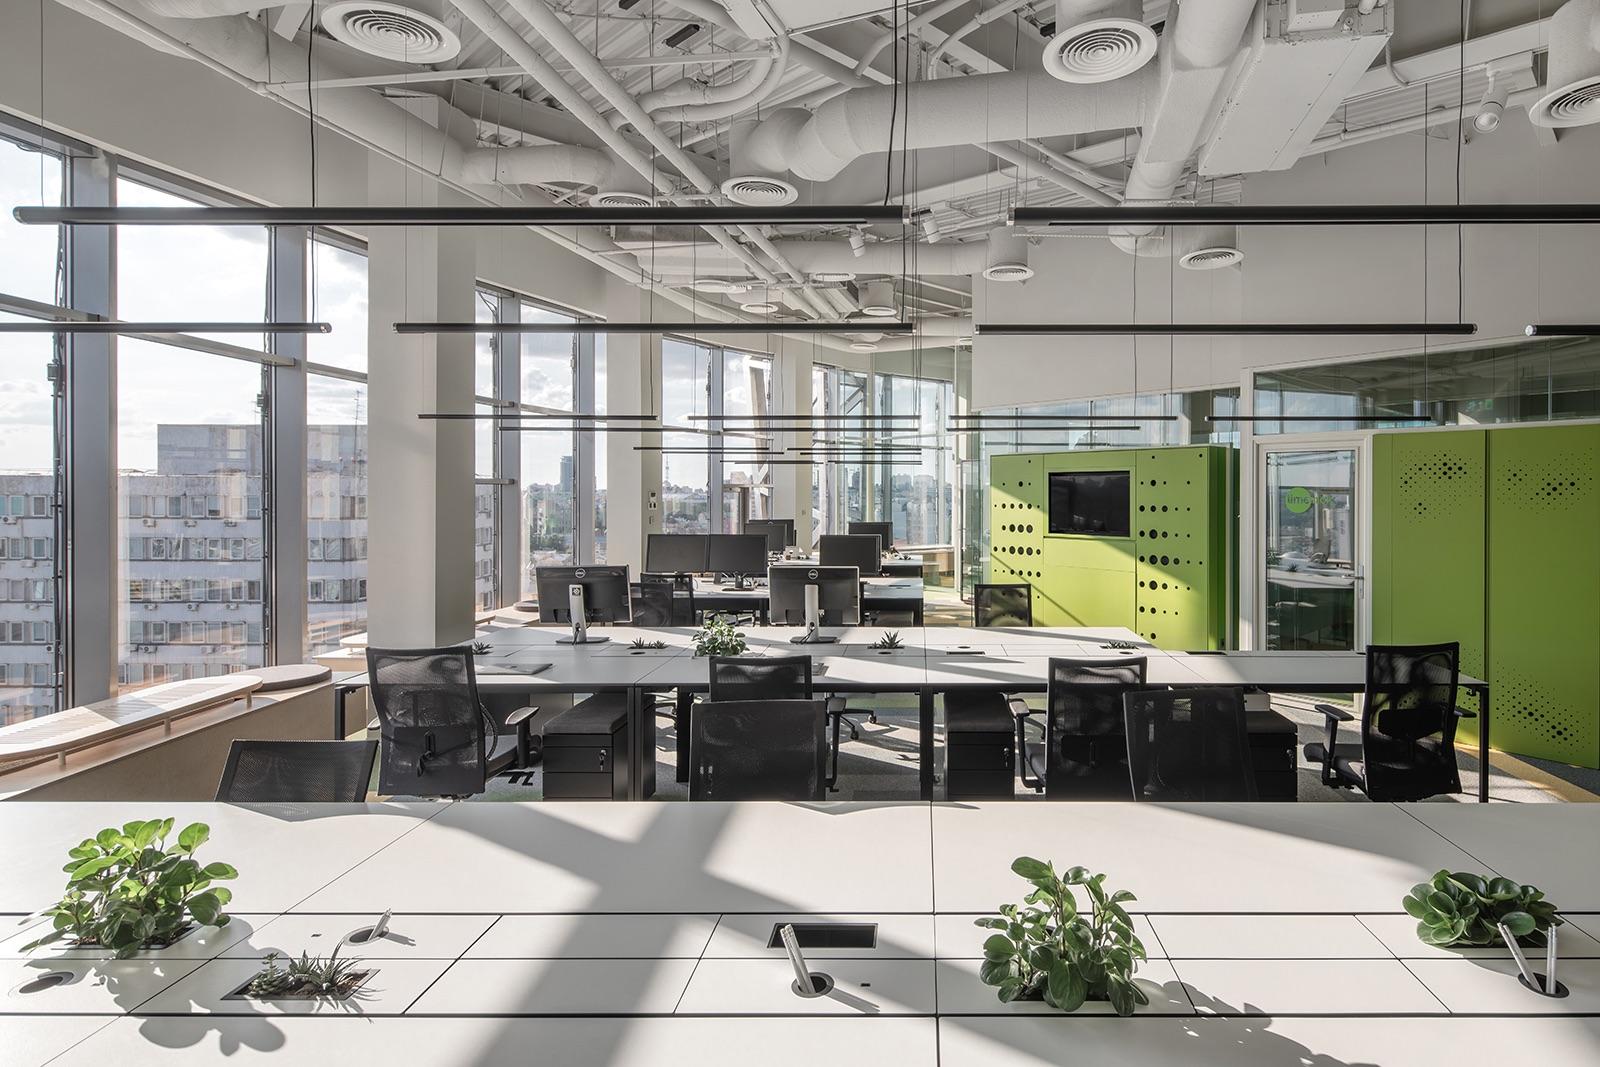 grammarly-office-kiev-17